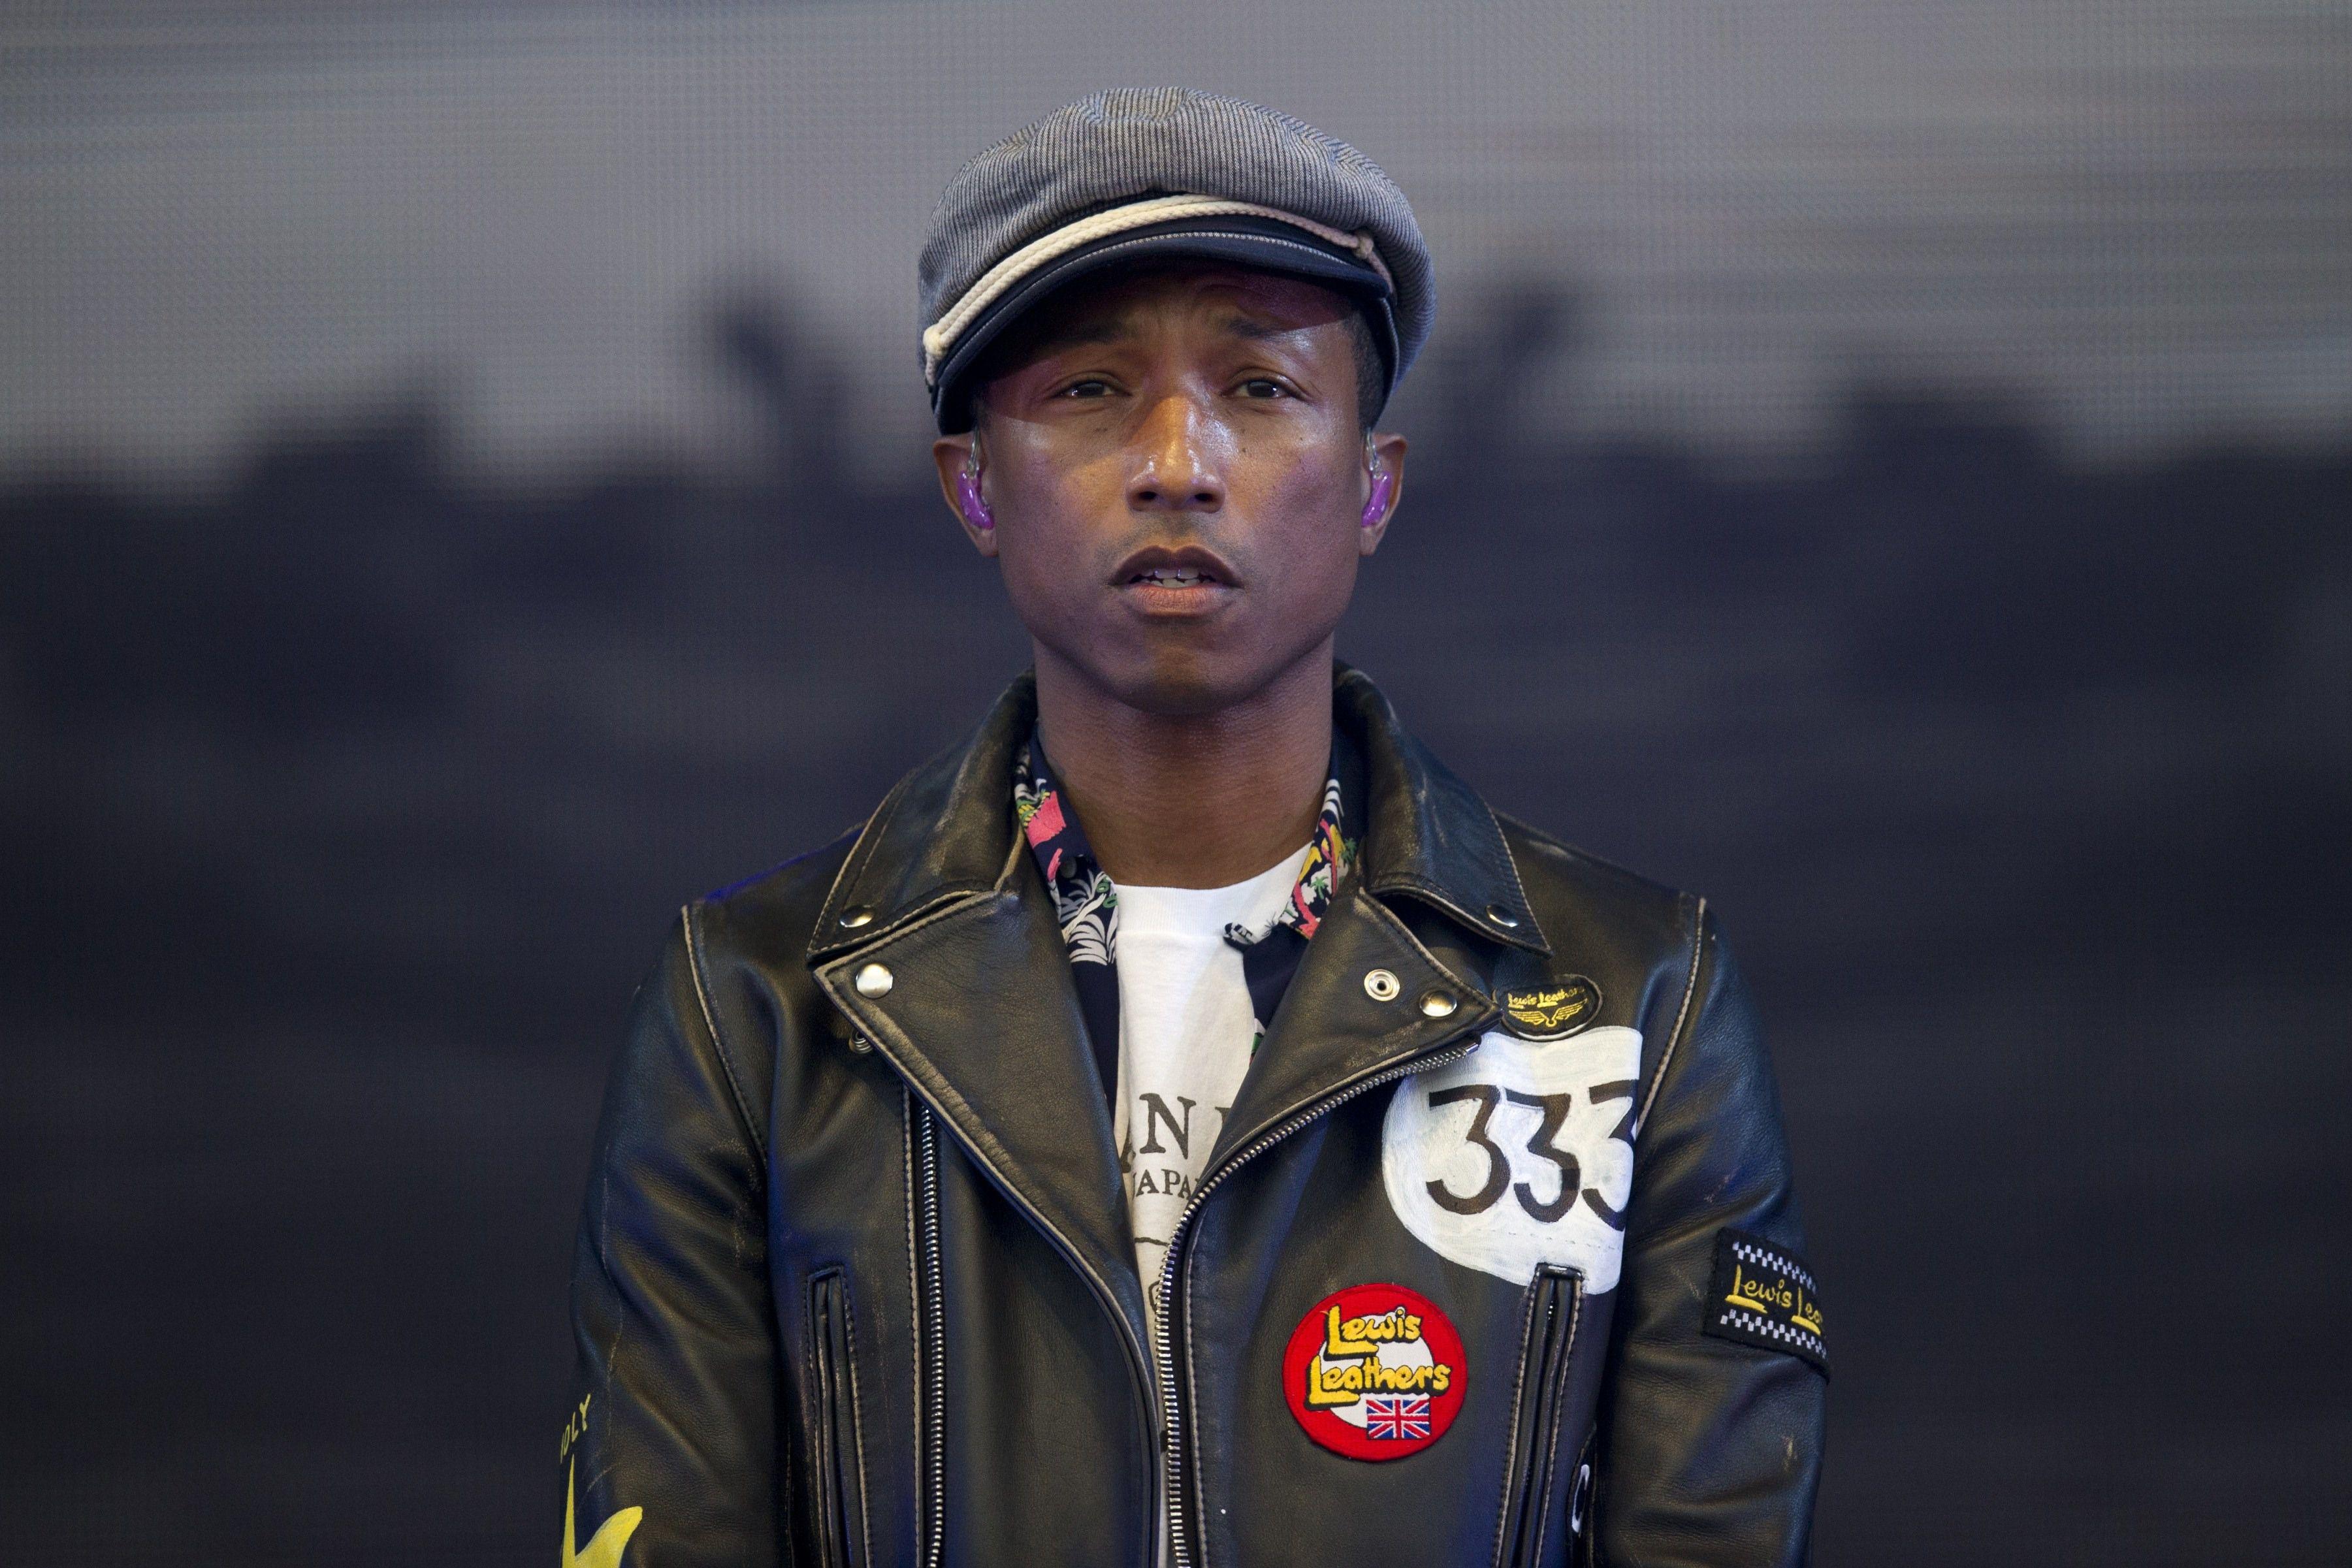 Pharrell Williams Wallpaper For Computer